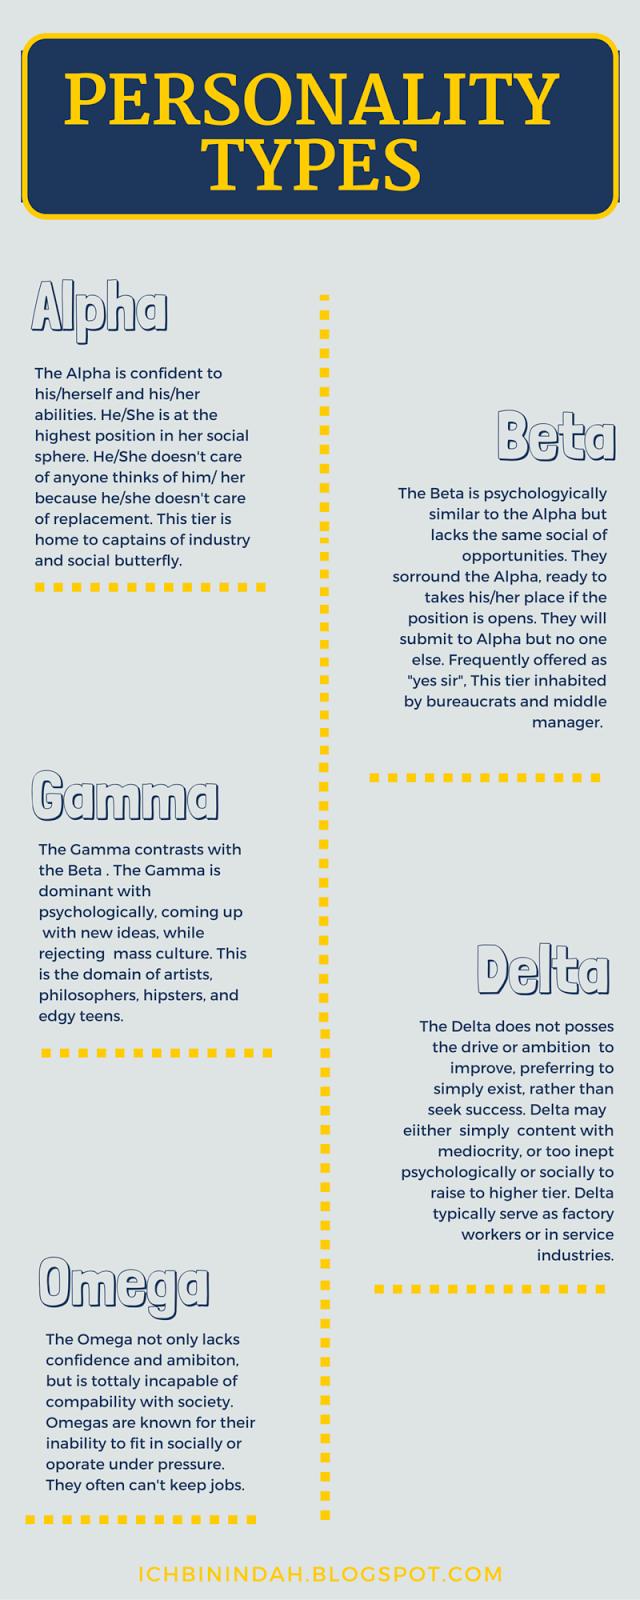 Alpha Woman, Beta Woman - ichbinindah